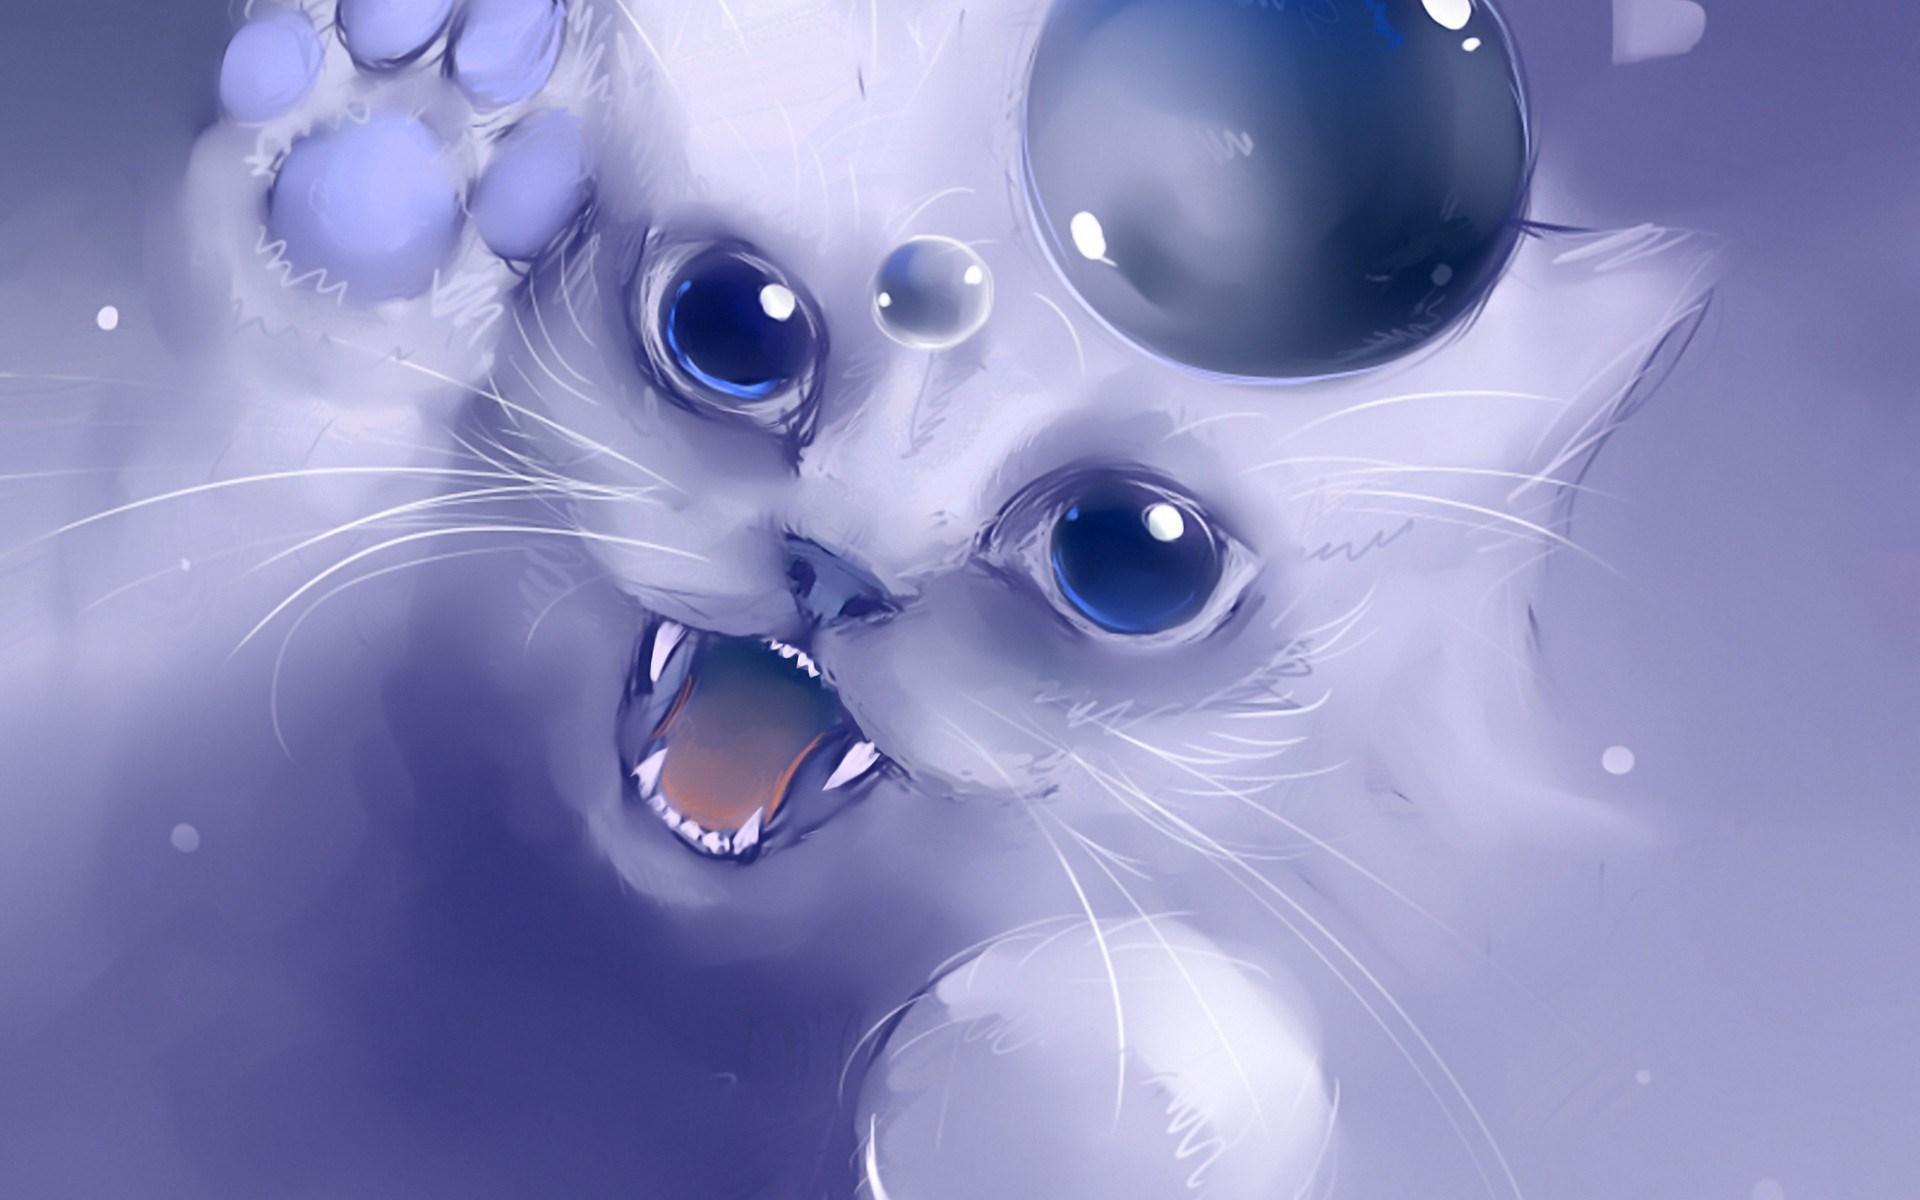 Artwork Manga Anime Wallpaper Kitty Cat Bubble Drawing Art